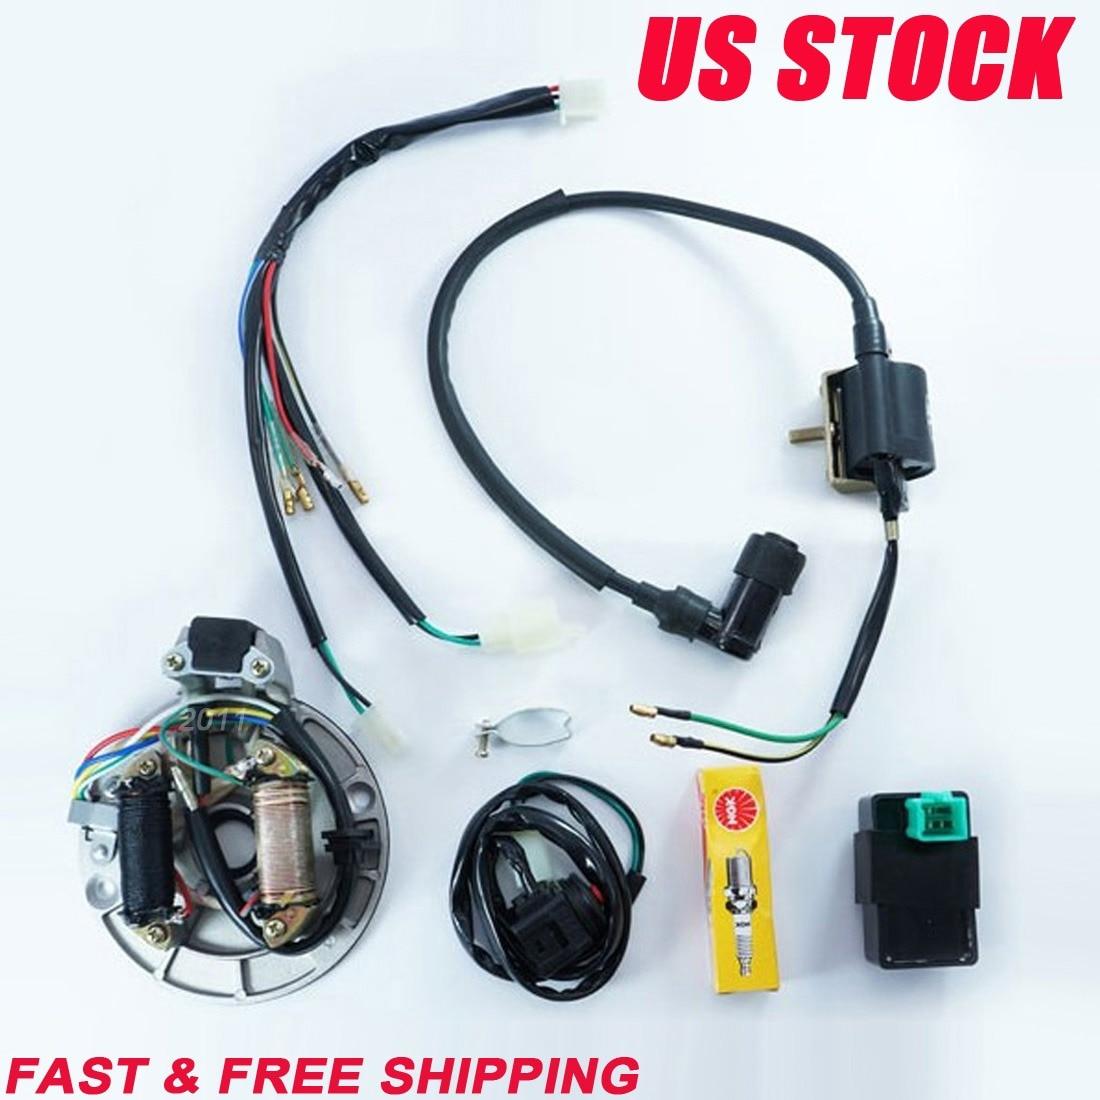 tdpro 50cc 110cc 125cc motorcycle cdi coil stator magneto plug wire harness loom fits 50cc 110cc [ 1100 x 1100 Pixel ]